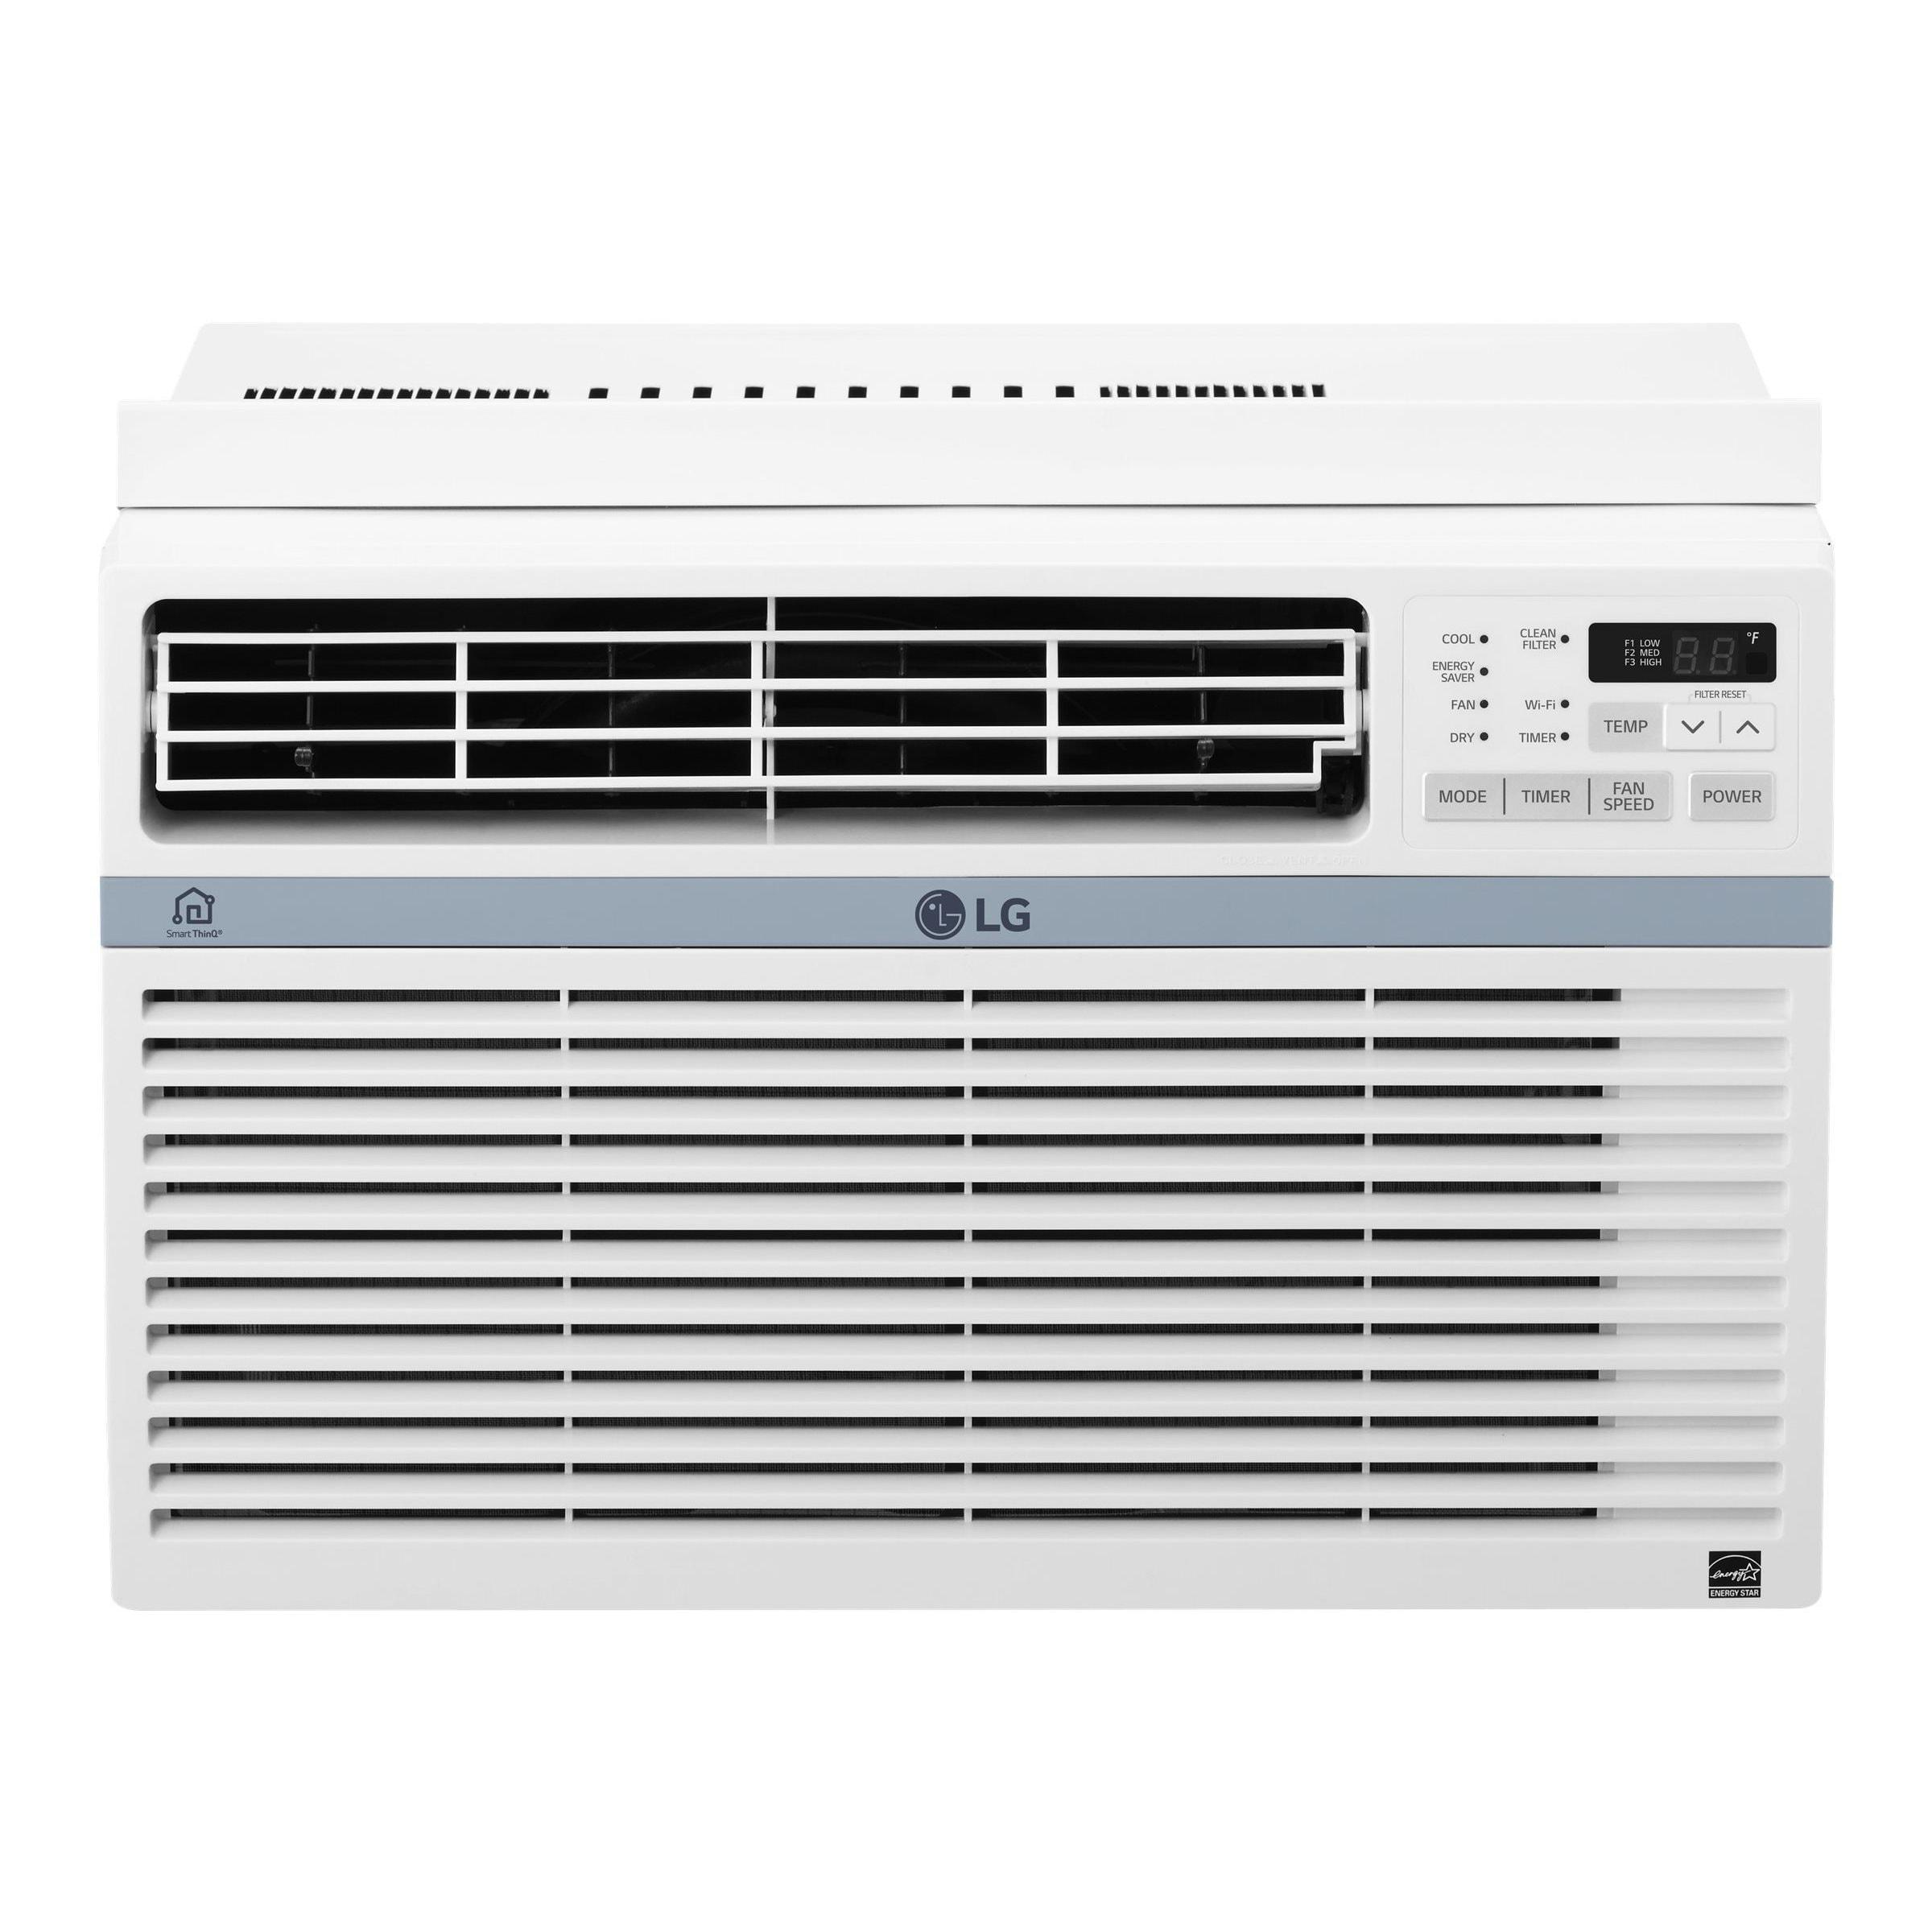 LG LW1017ERSM 115 V Window Mounted 10000 BTU Air Conditio...